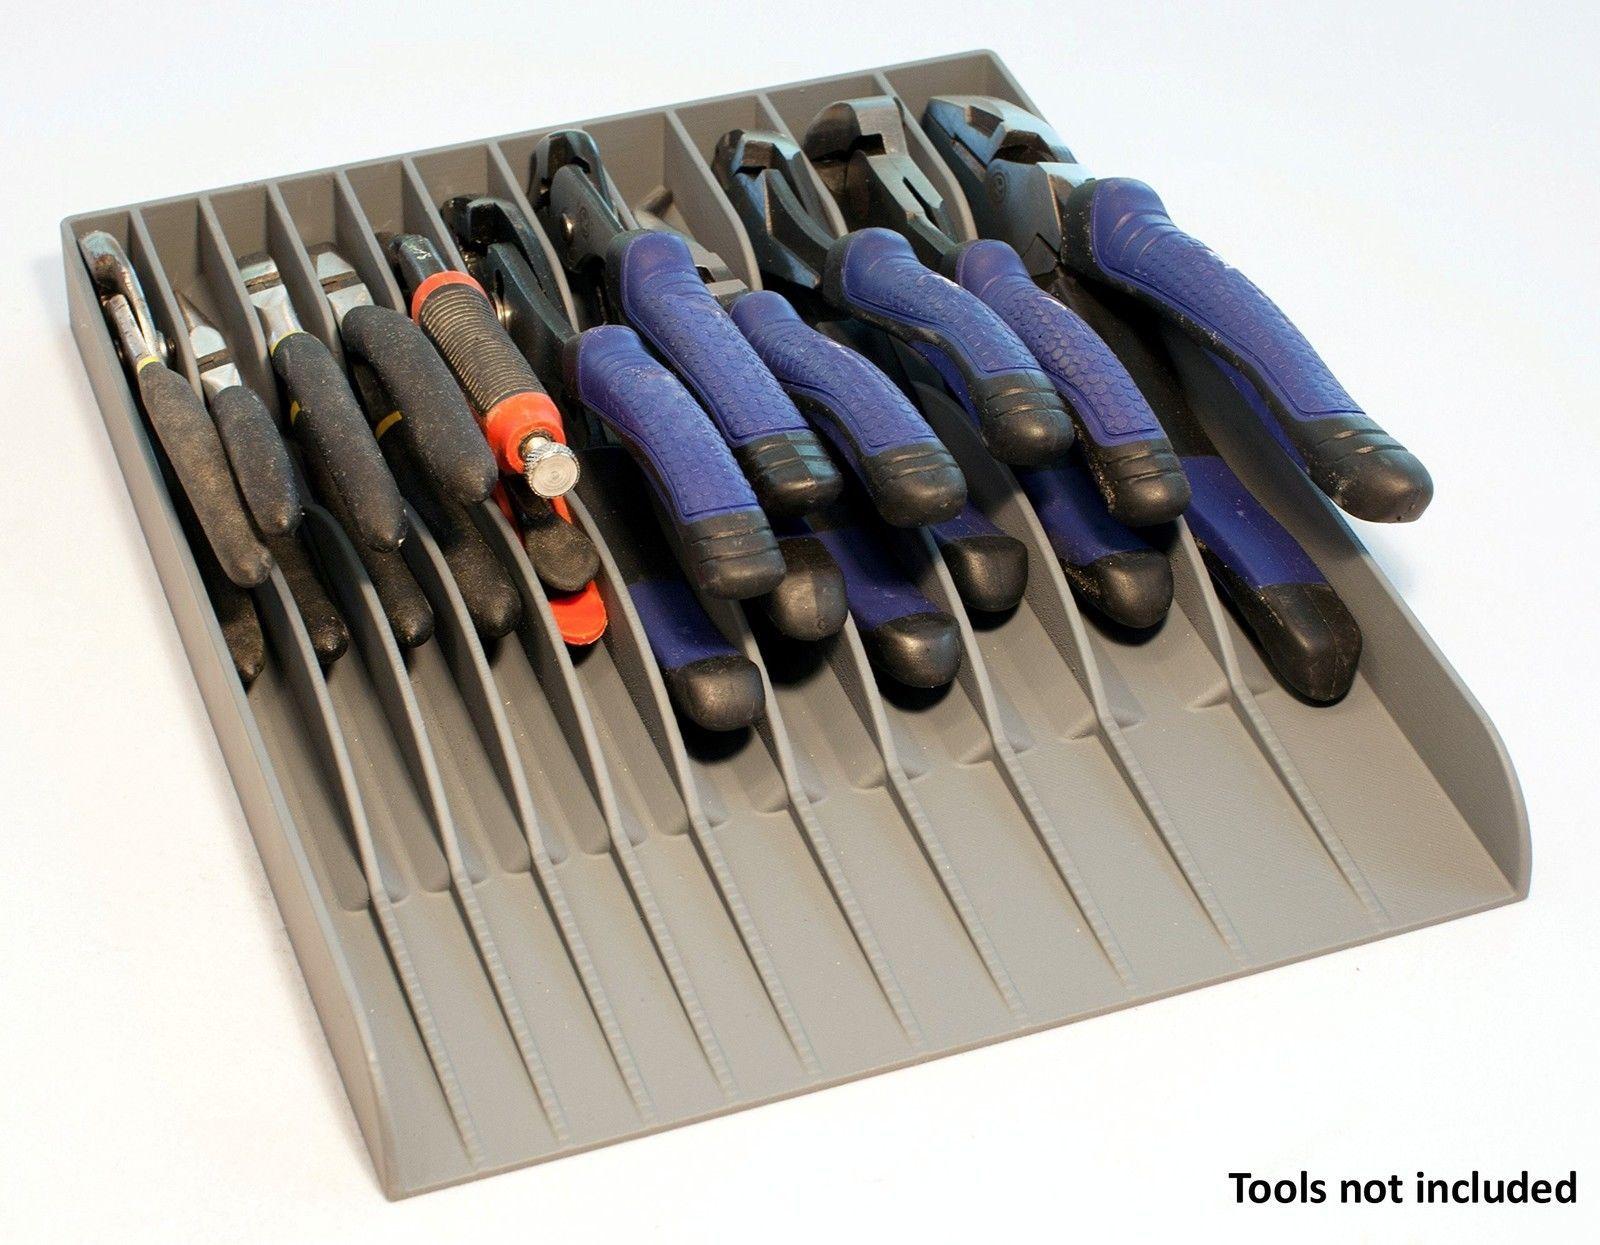 new tool box 11 pliers organizer sorter holder tray rack